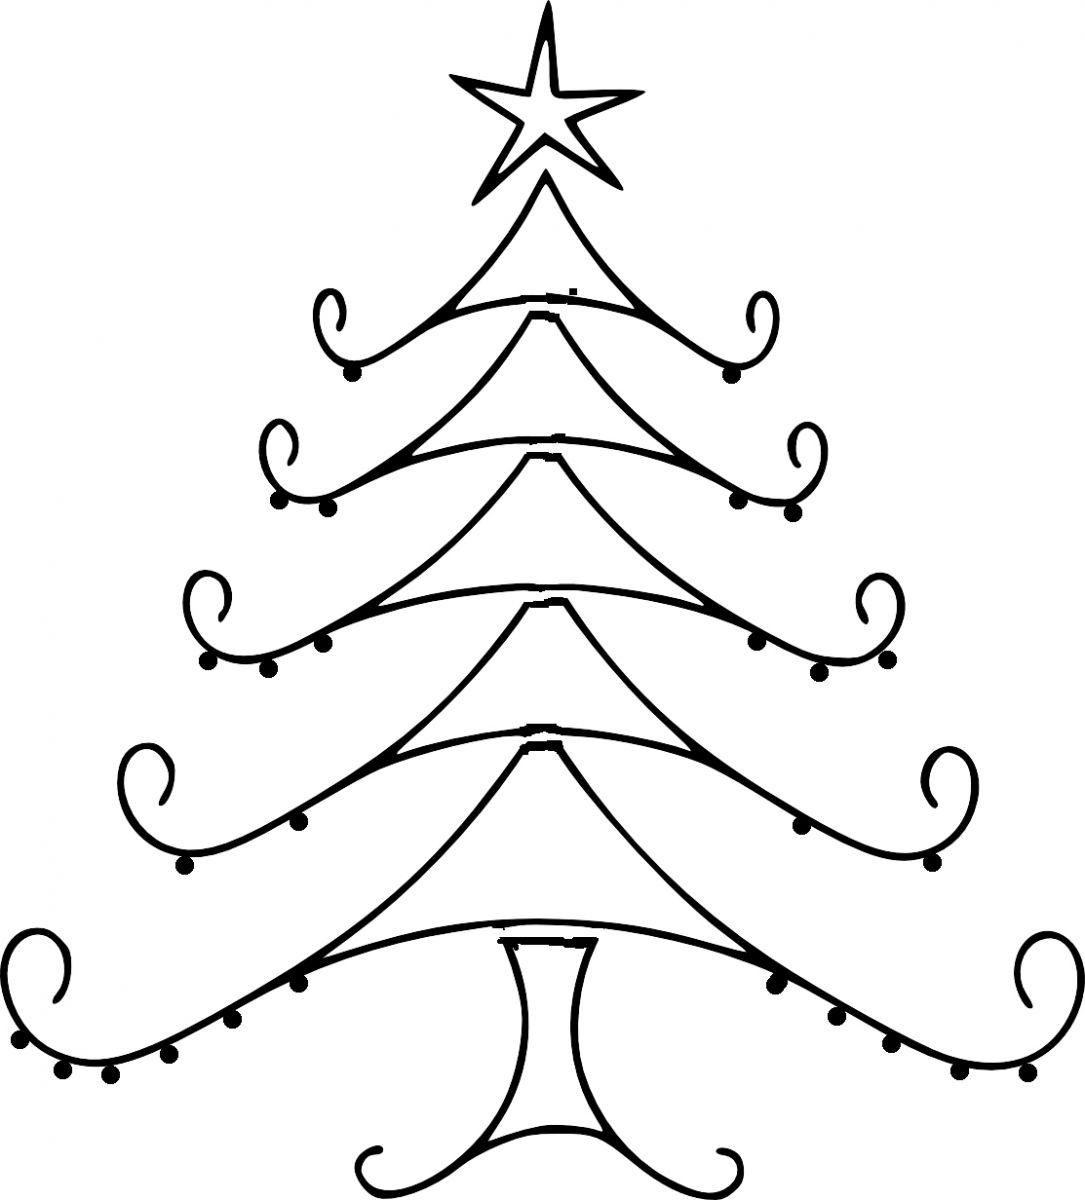 Christmas line drawing clipart jpg free library Free Christmas Tree Line Drawing, Download Free Clip Art, Free Clip ... jpg free library